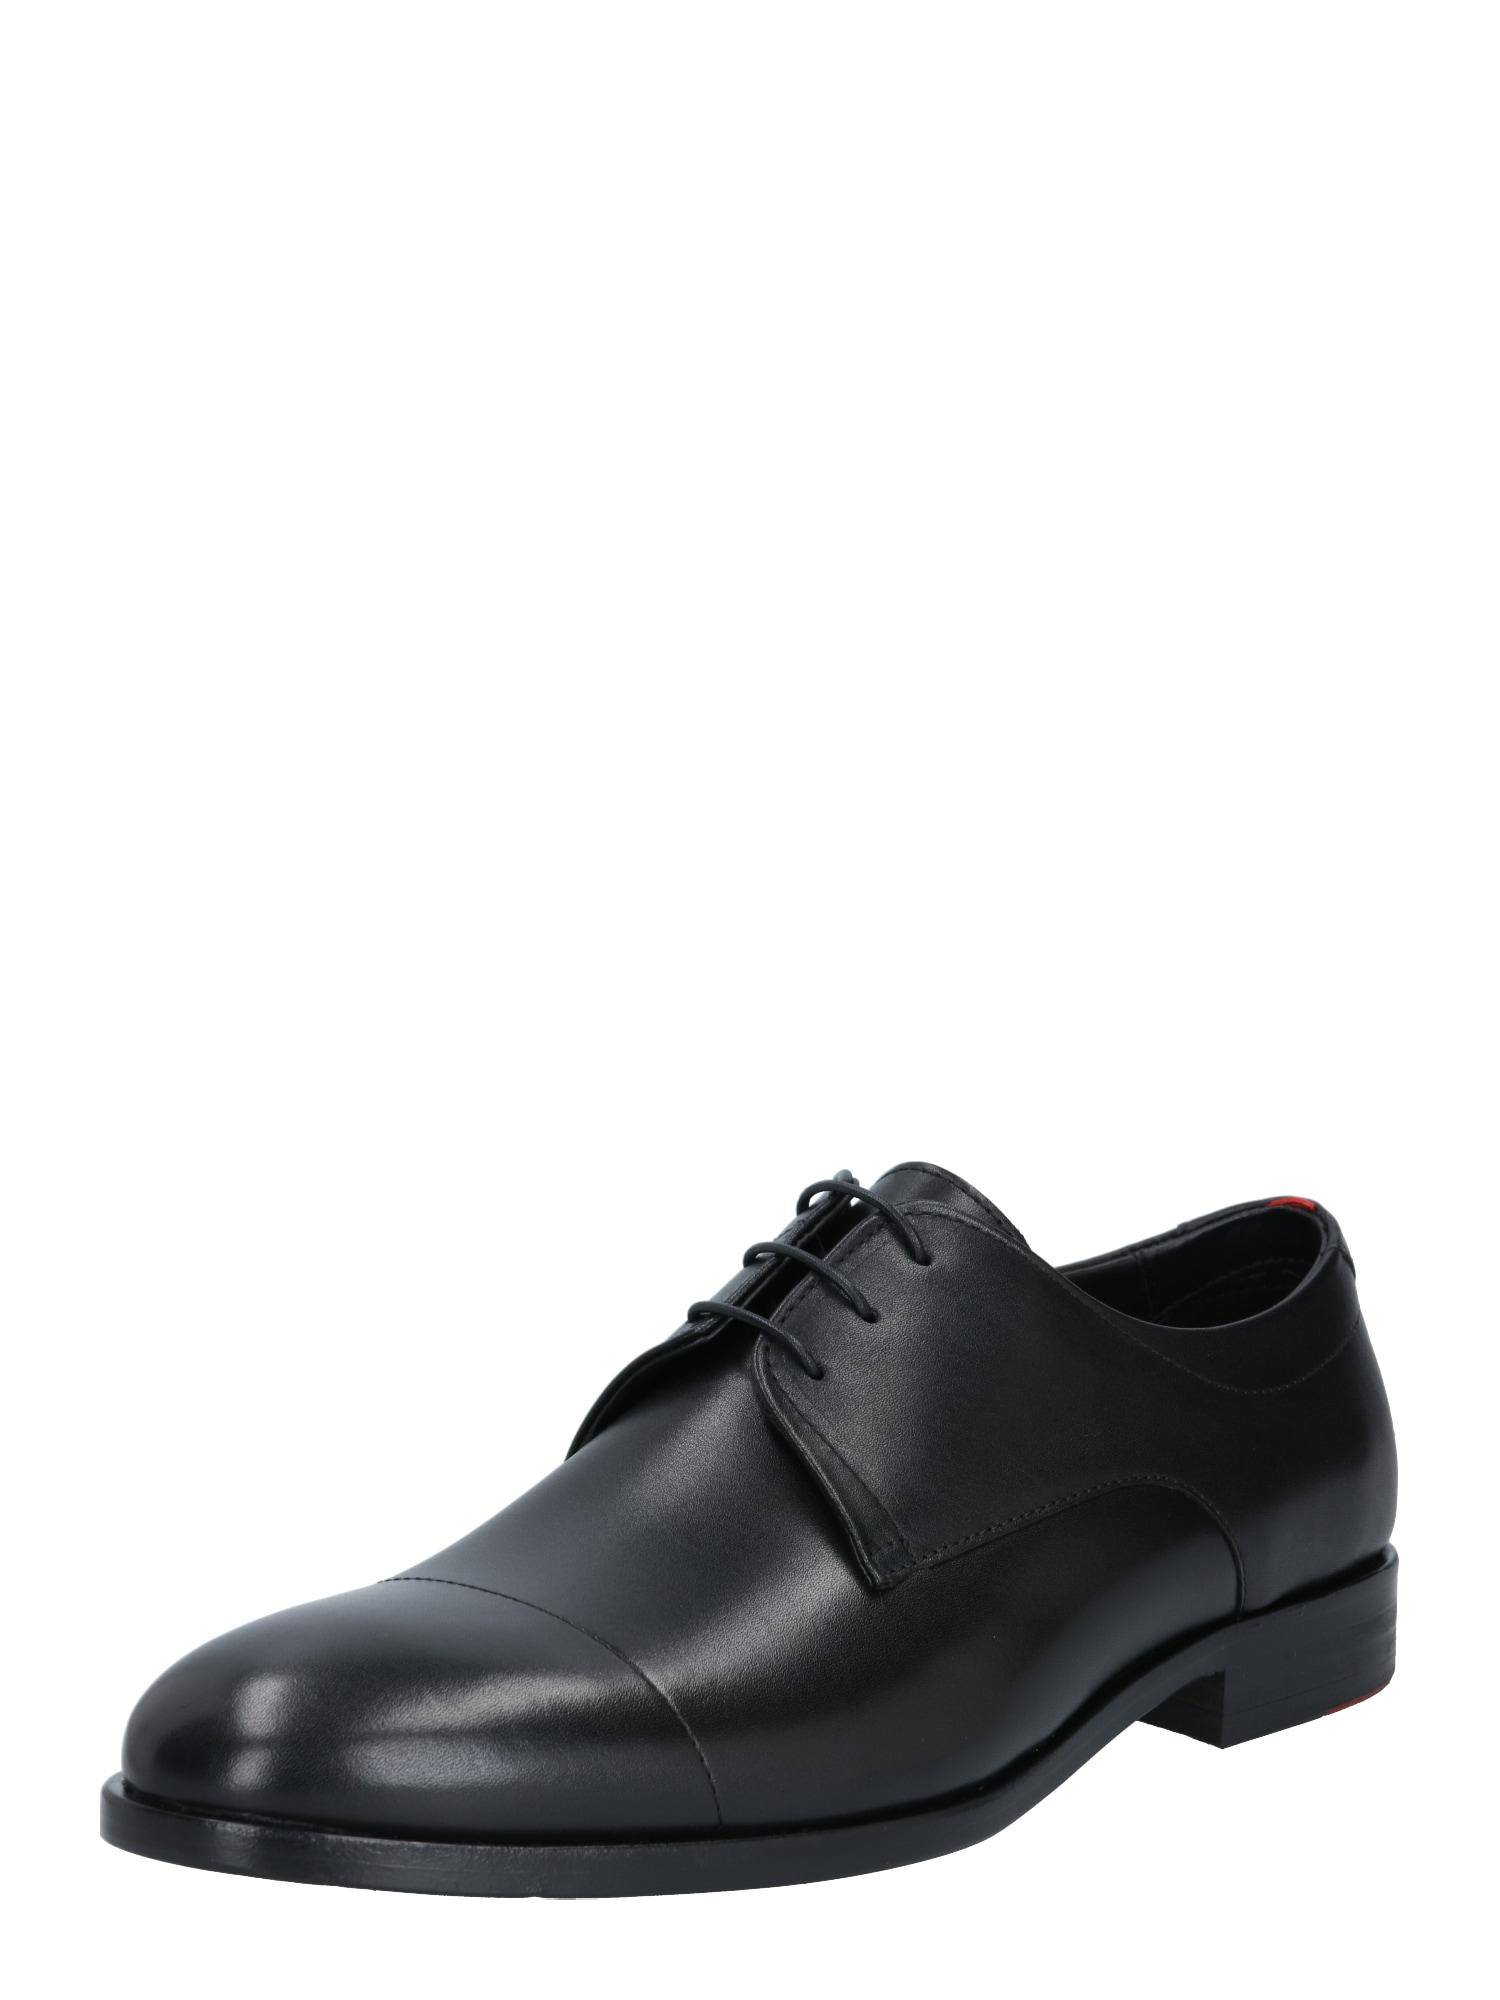 HUGO Šněrovací boty 'Midtown'  černá